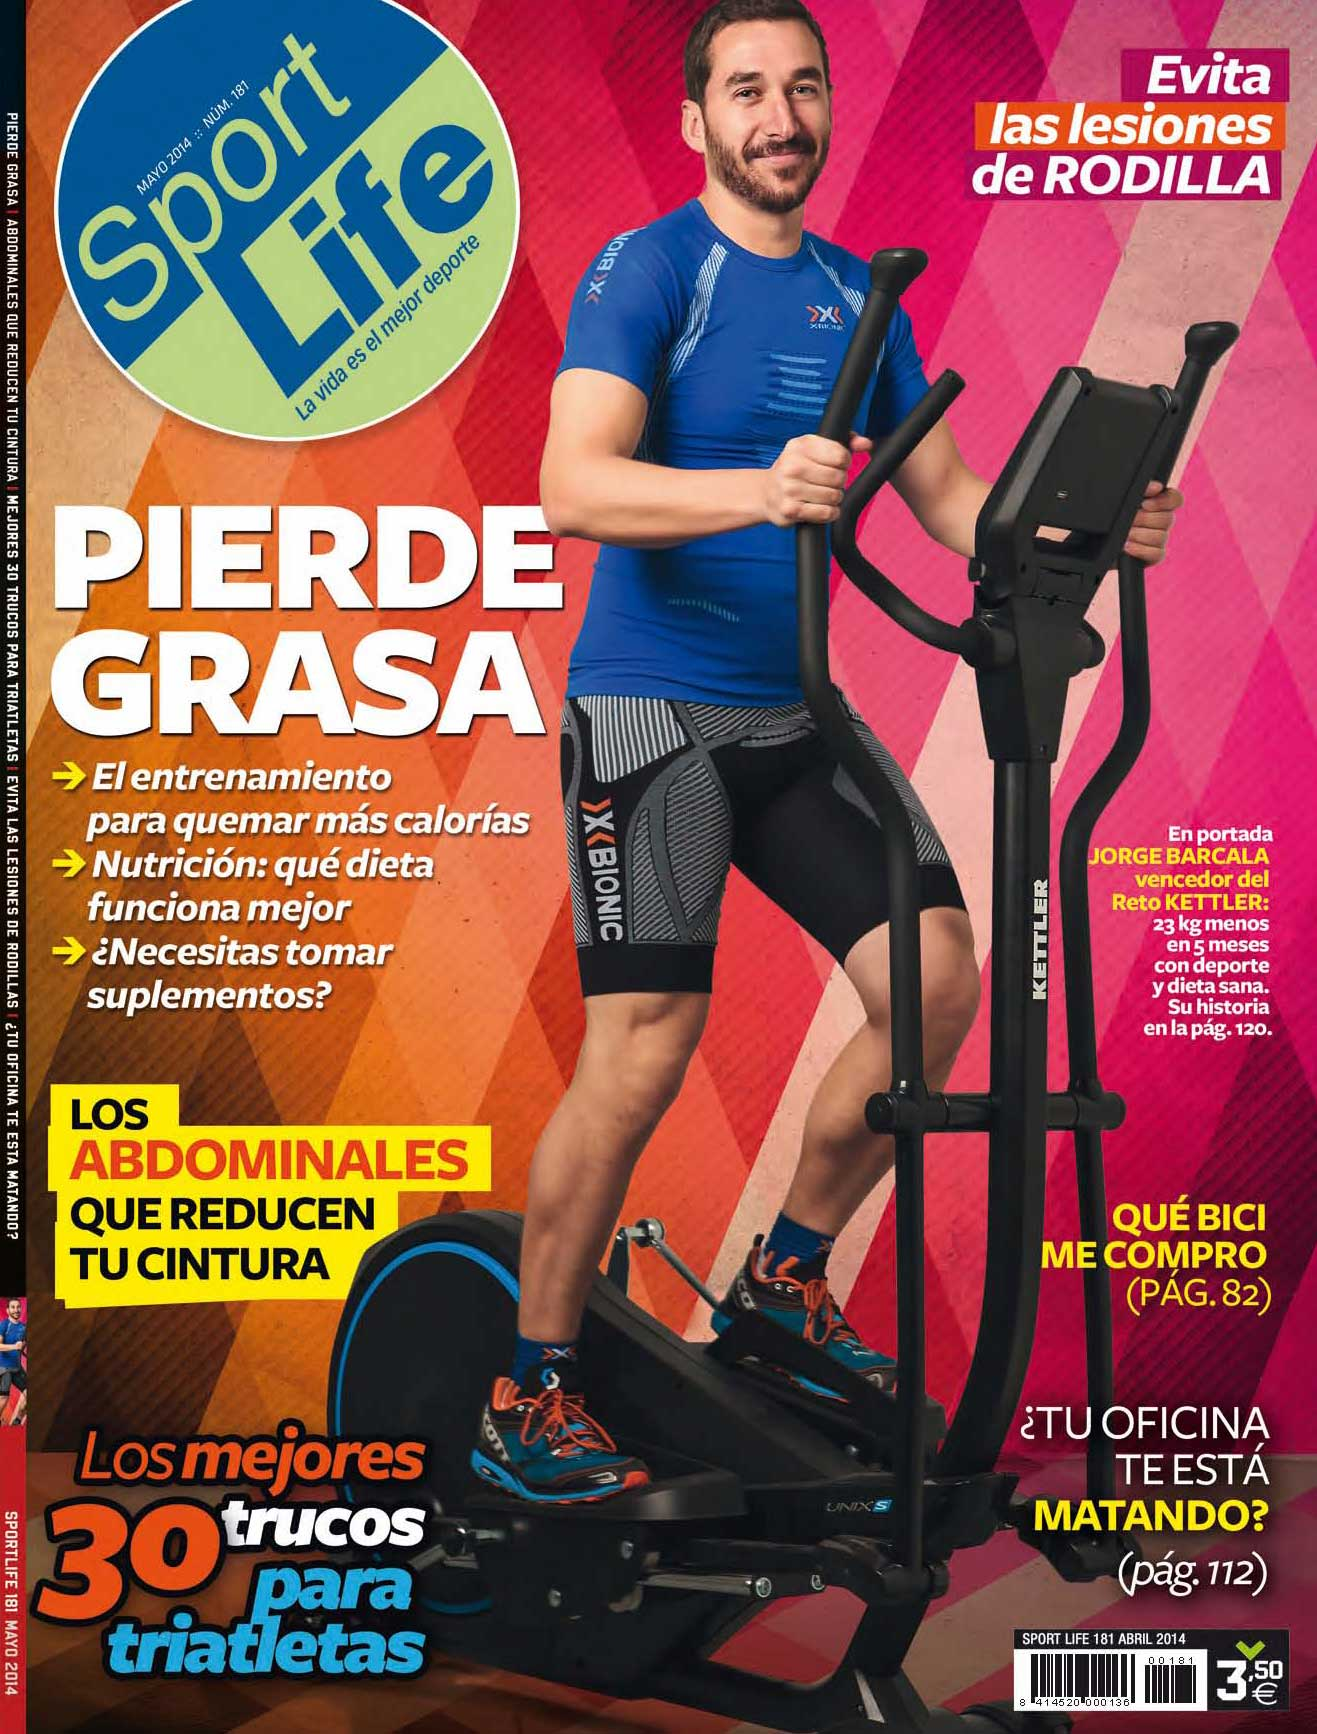 Sumario Sport Life 181 Mayo 2014